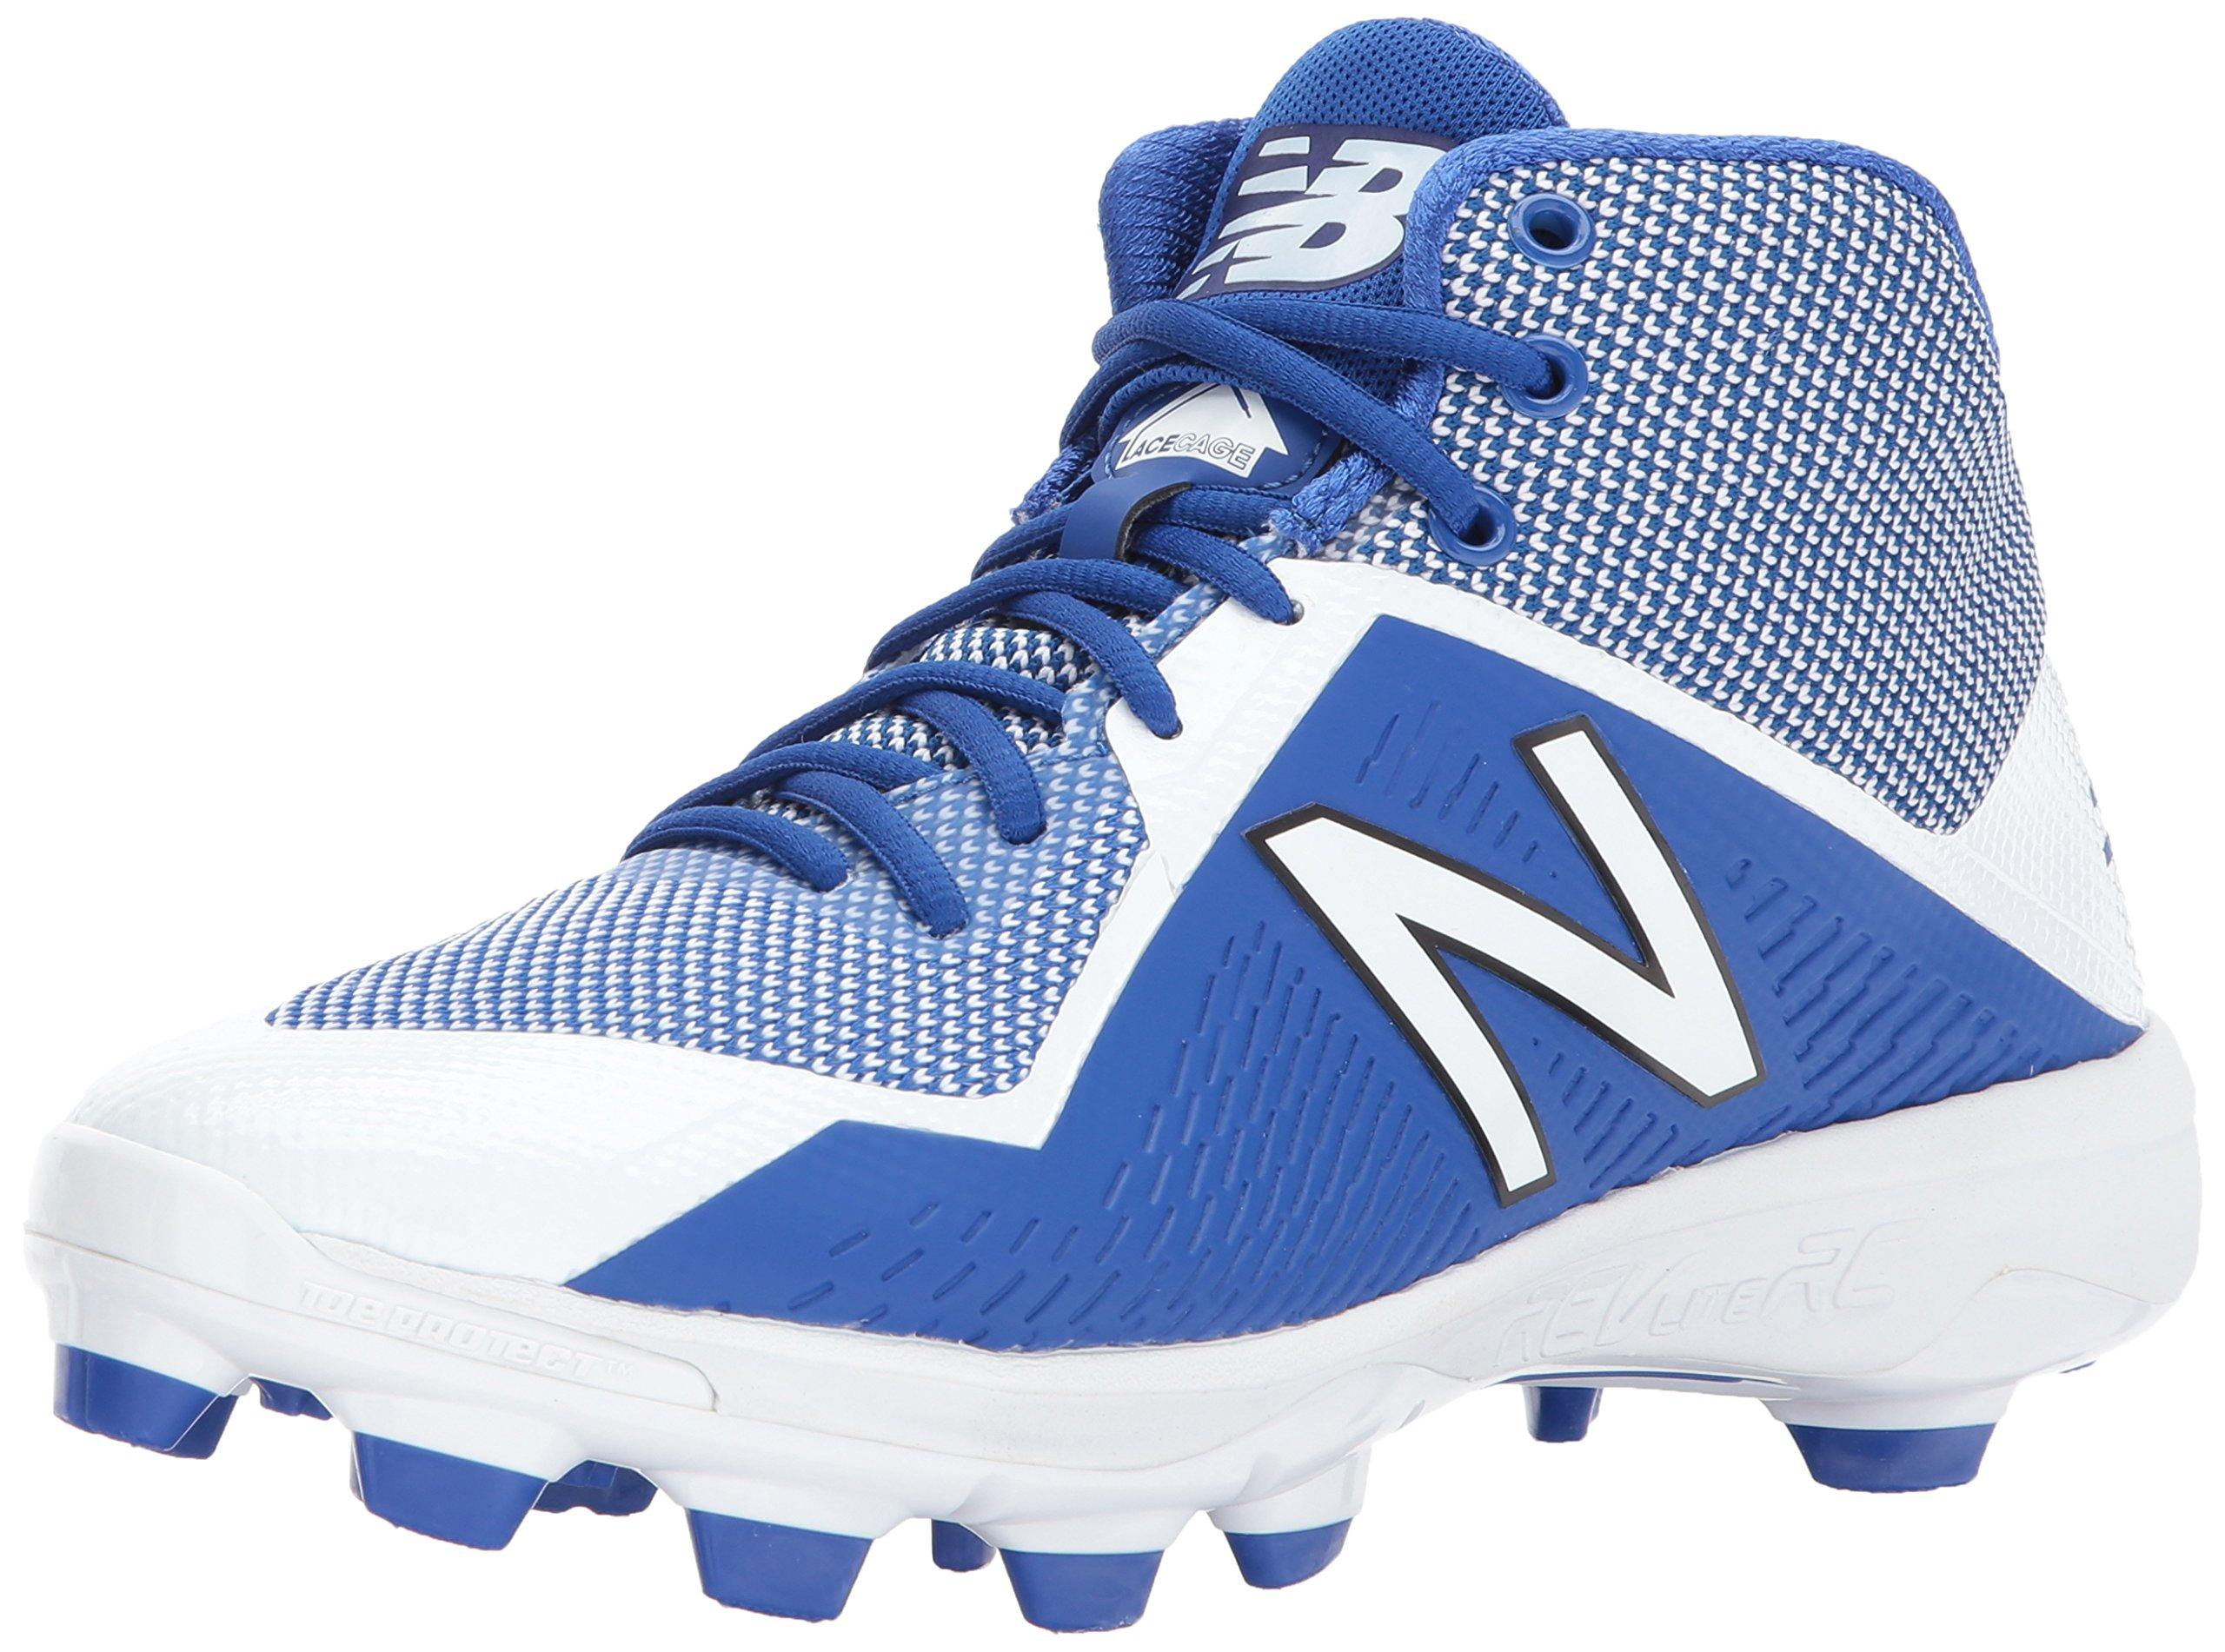 New Balance Men's PM4040v4 Molded Baseball Shoe, Royal/White, 11 D US by New Balance